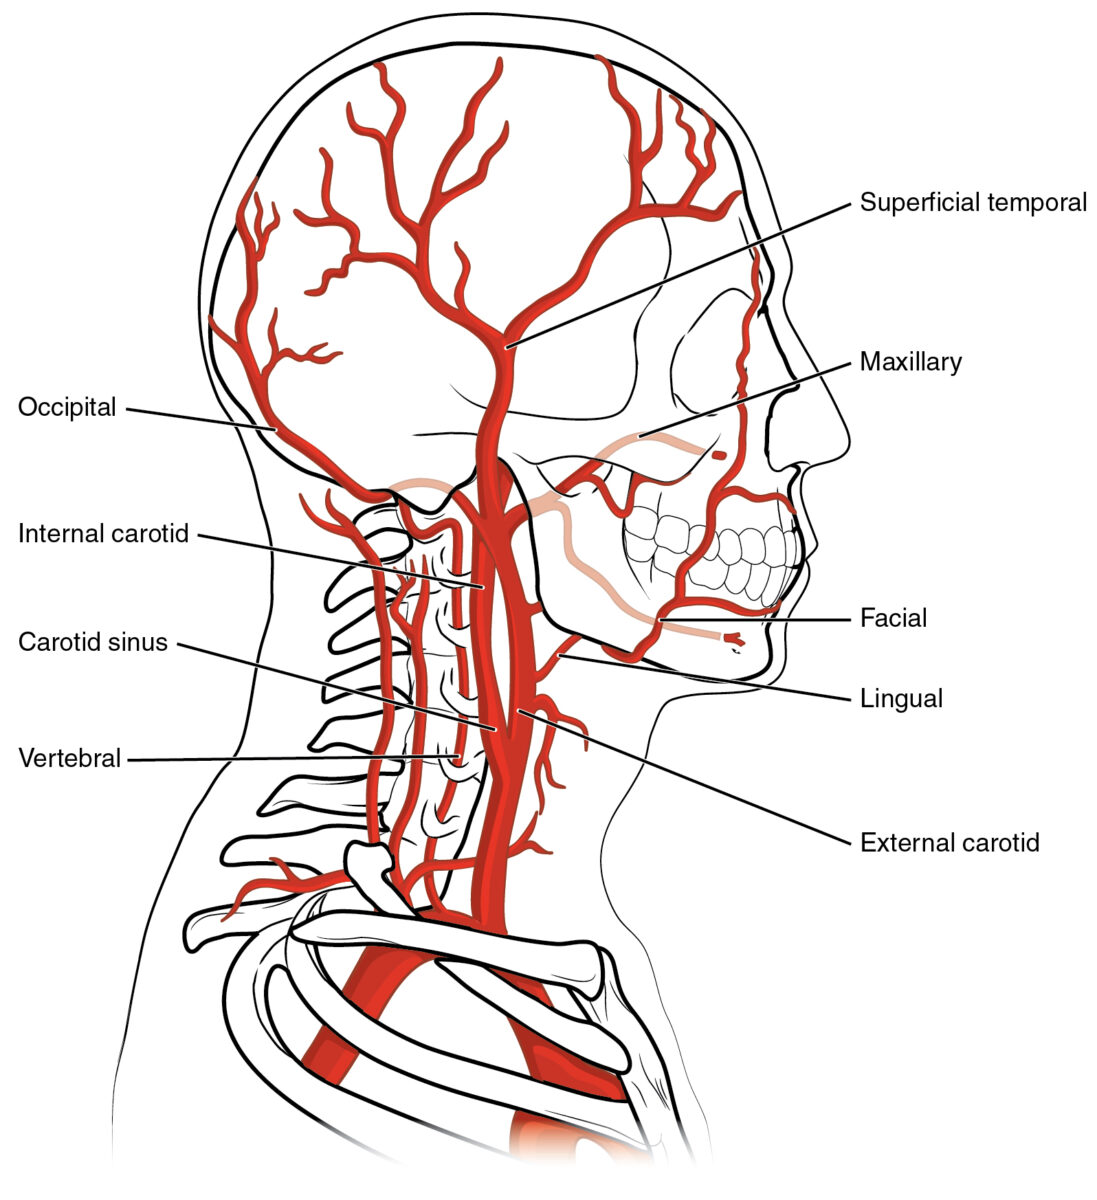 Anatomy of vertebral and carotid arteries